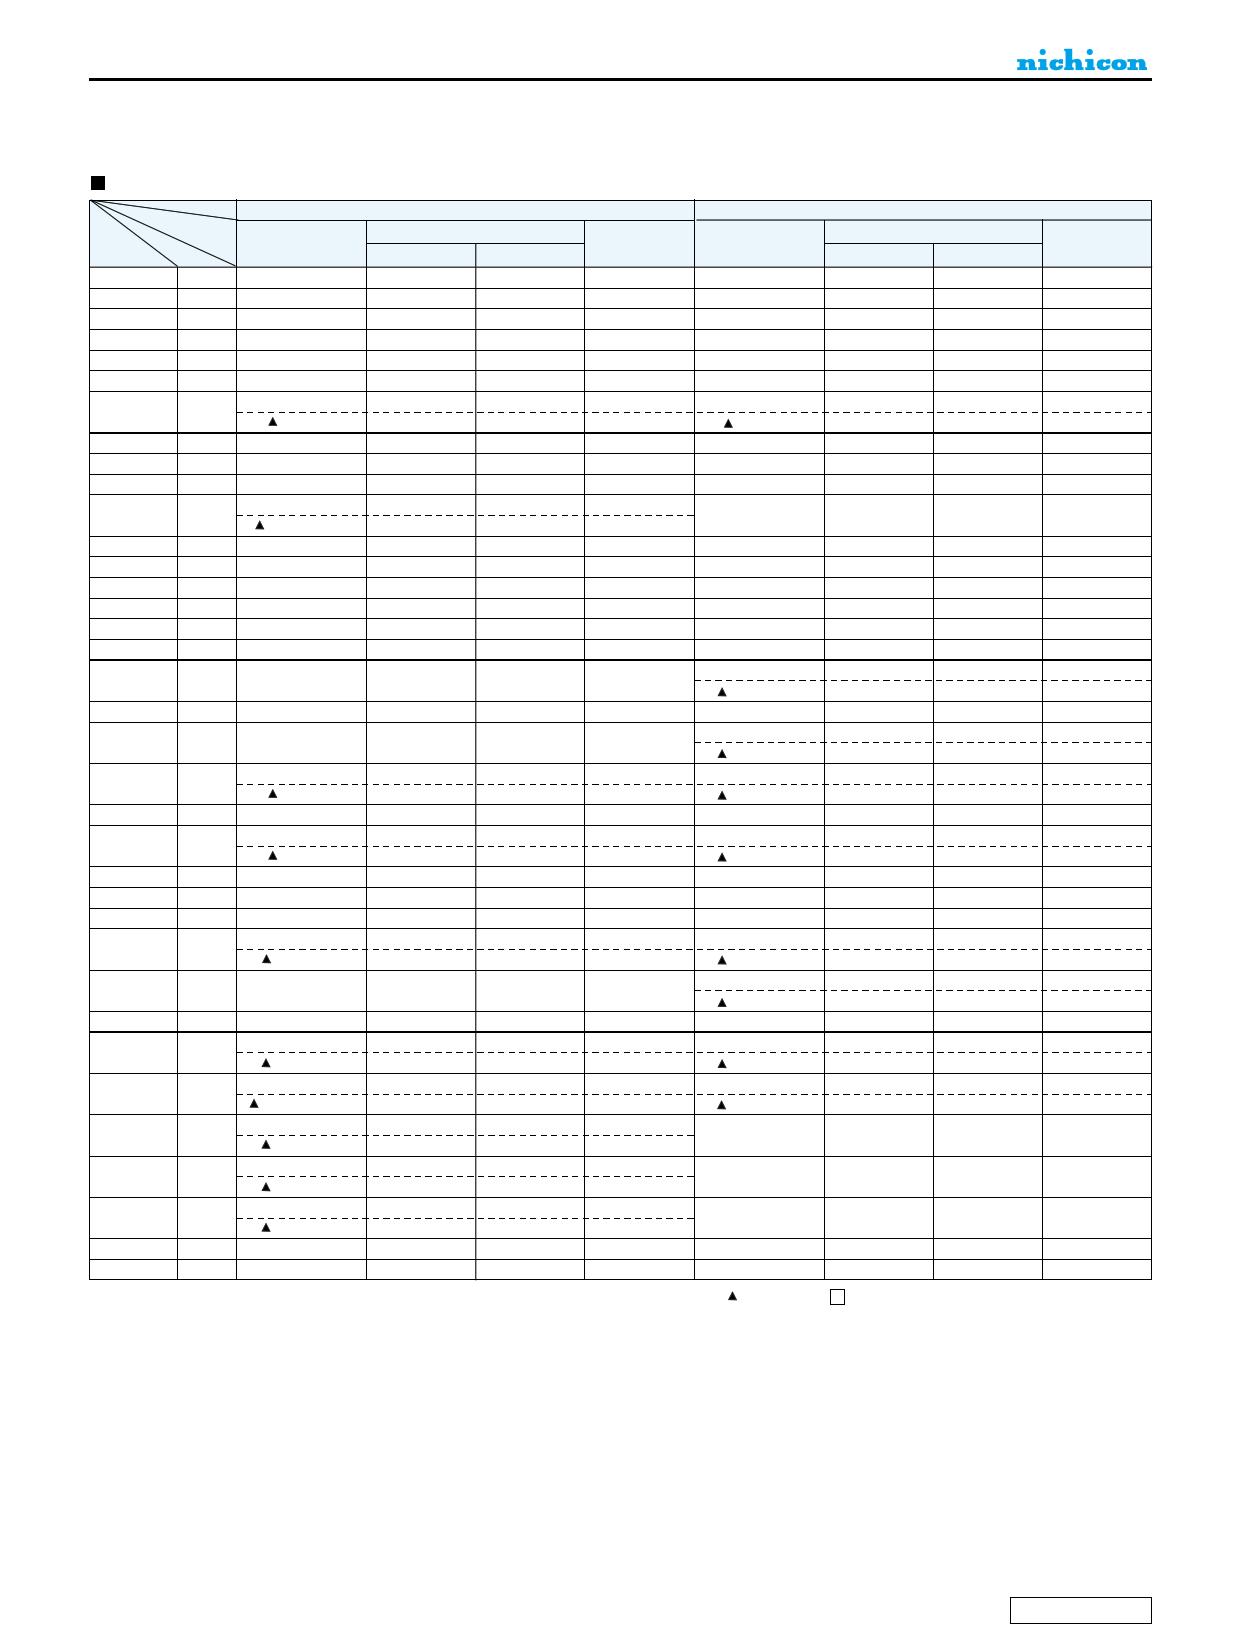 UPW1E101MED pdf, 반도체, 판매, 대치품